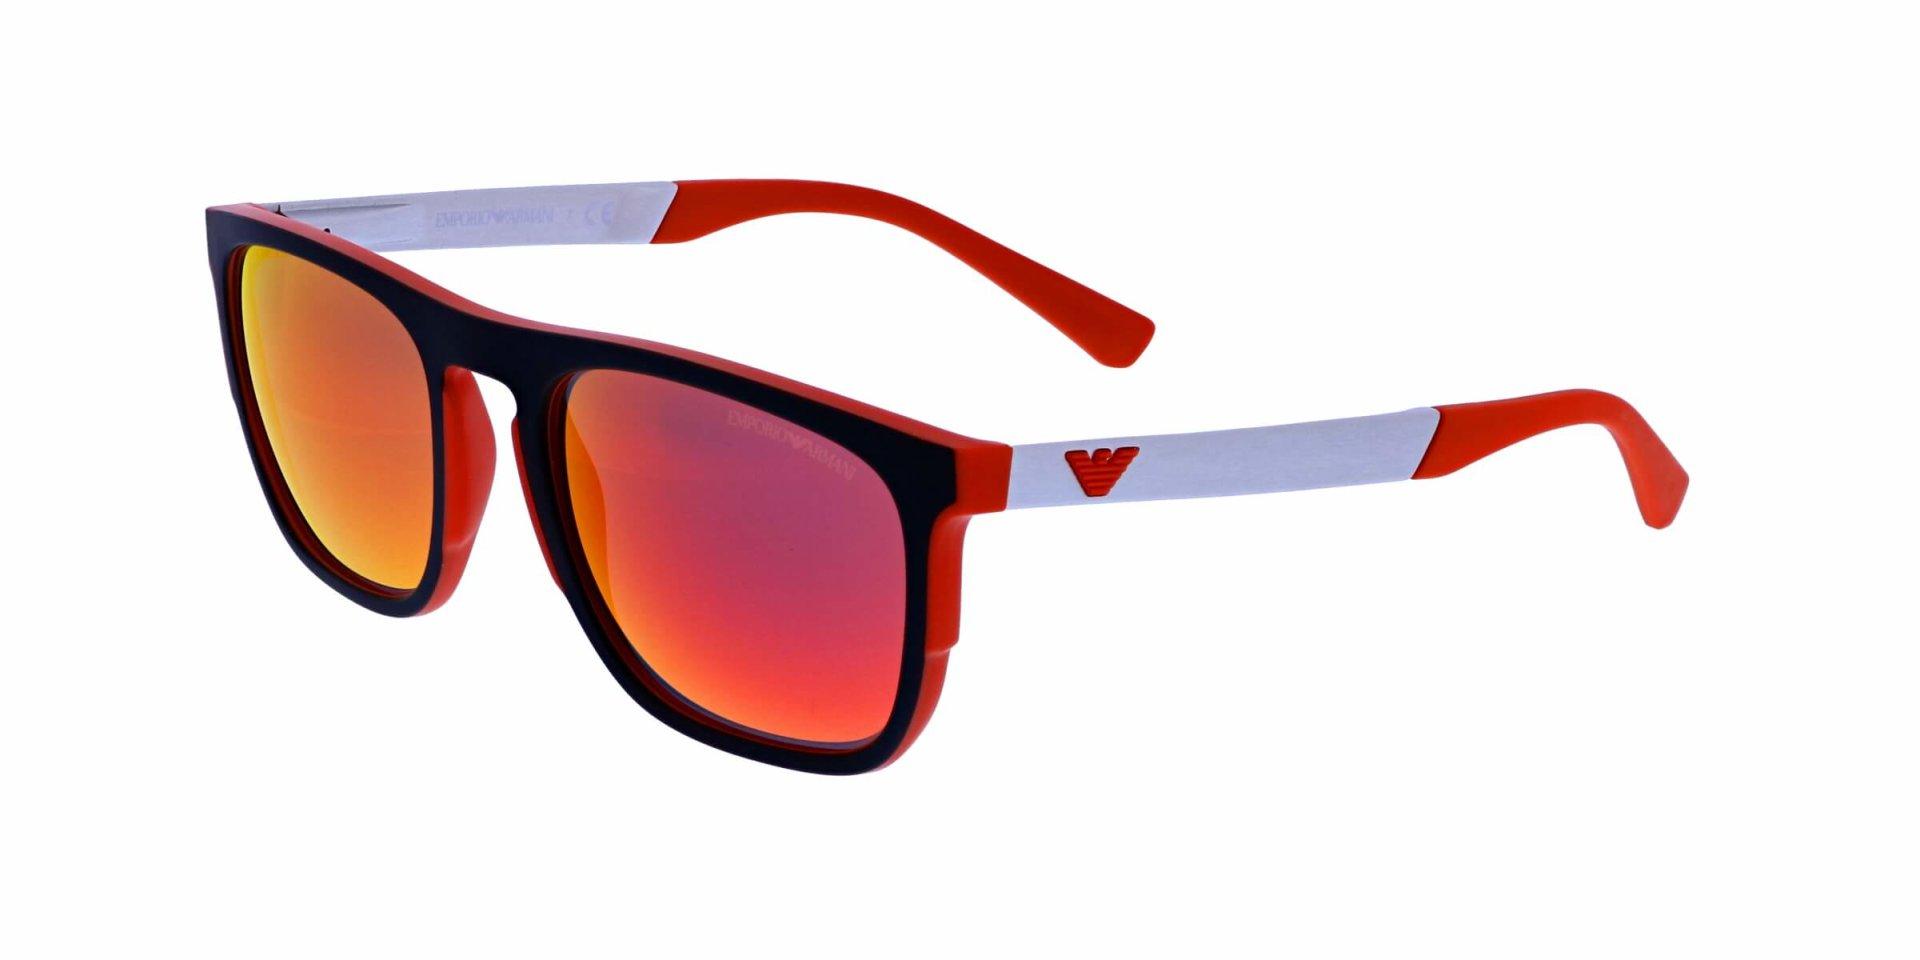 936ddcaf8d Sunglasses EMPORIO ARMANI